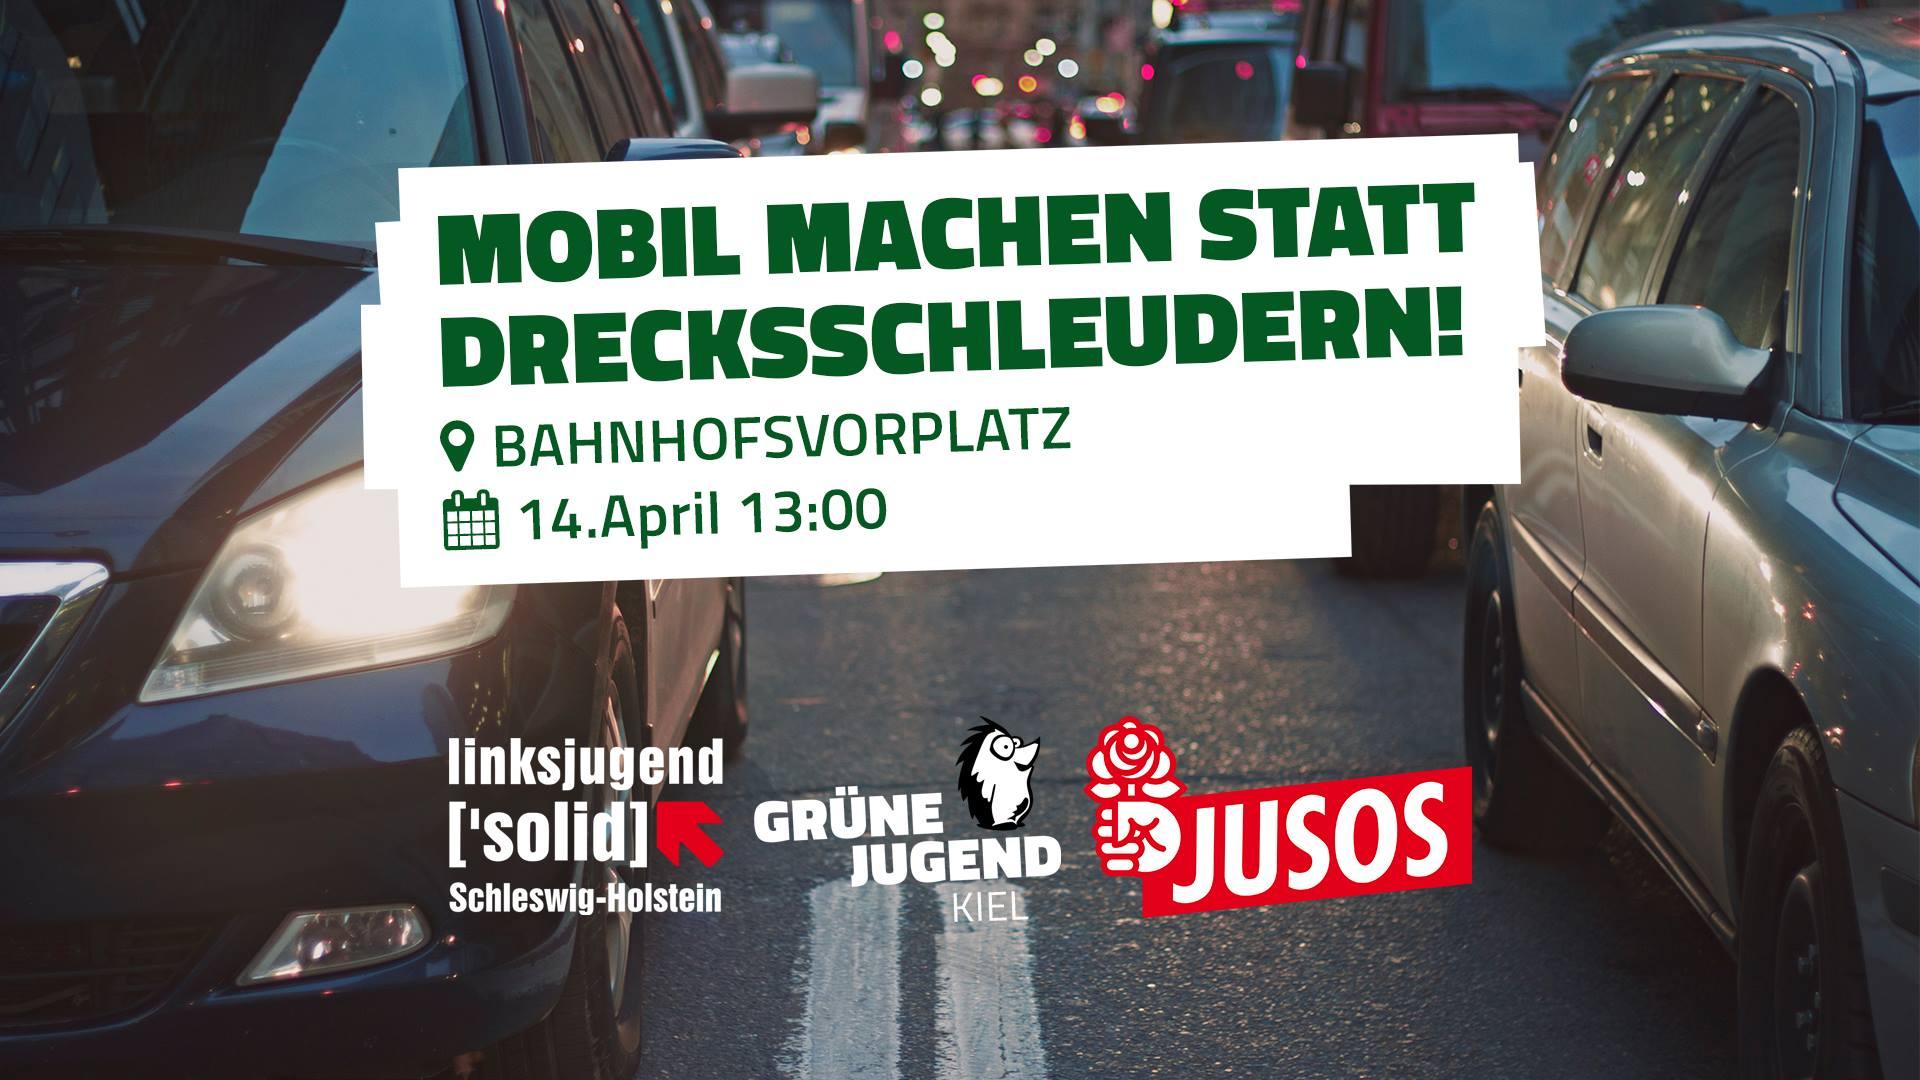 Mobil machen statt Drecksschleudern! 14. April, 13:00, Bahnhofsvorplatz Kiel